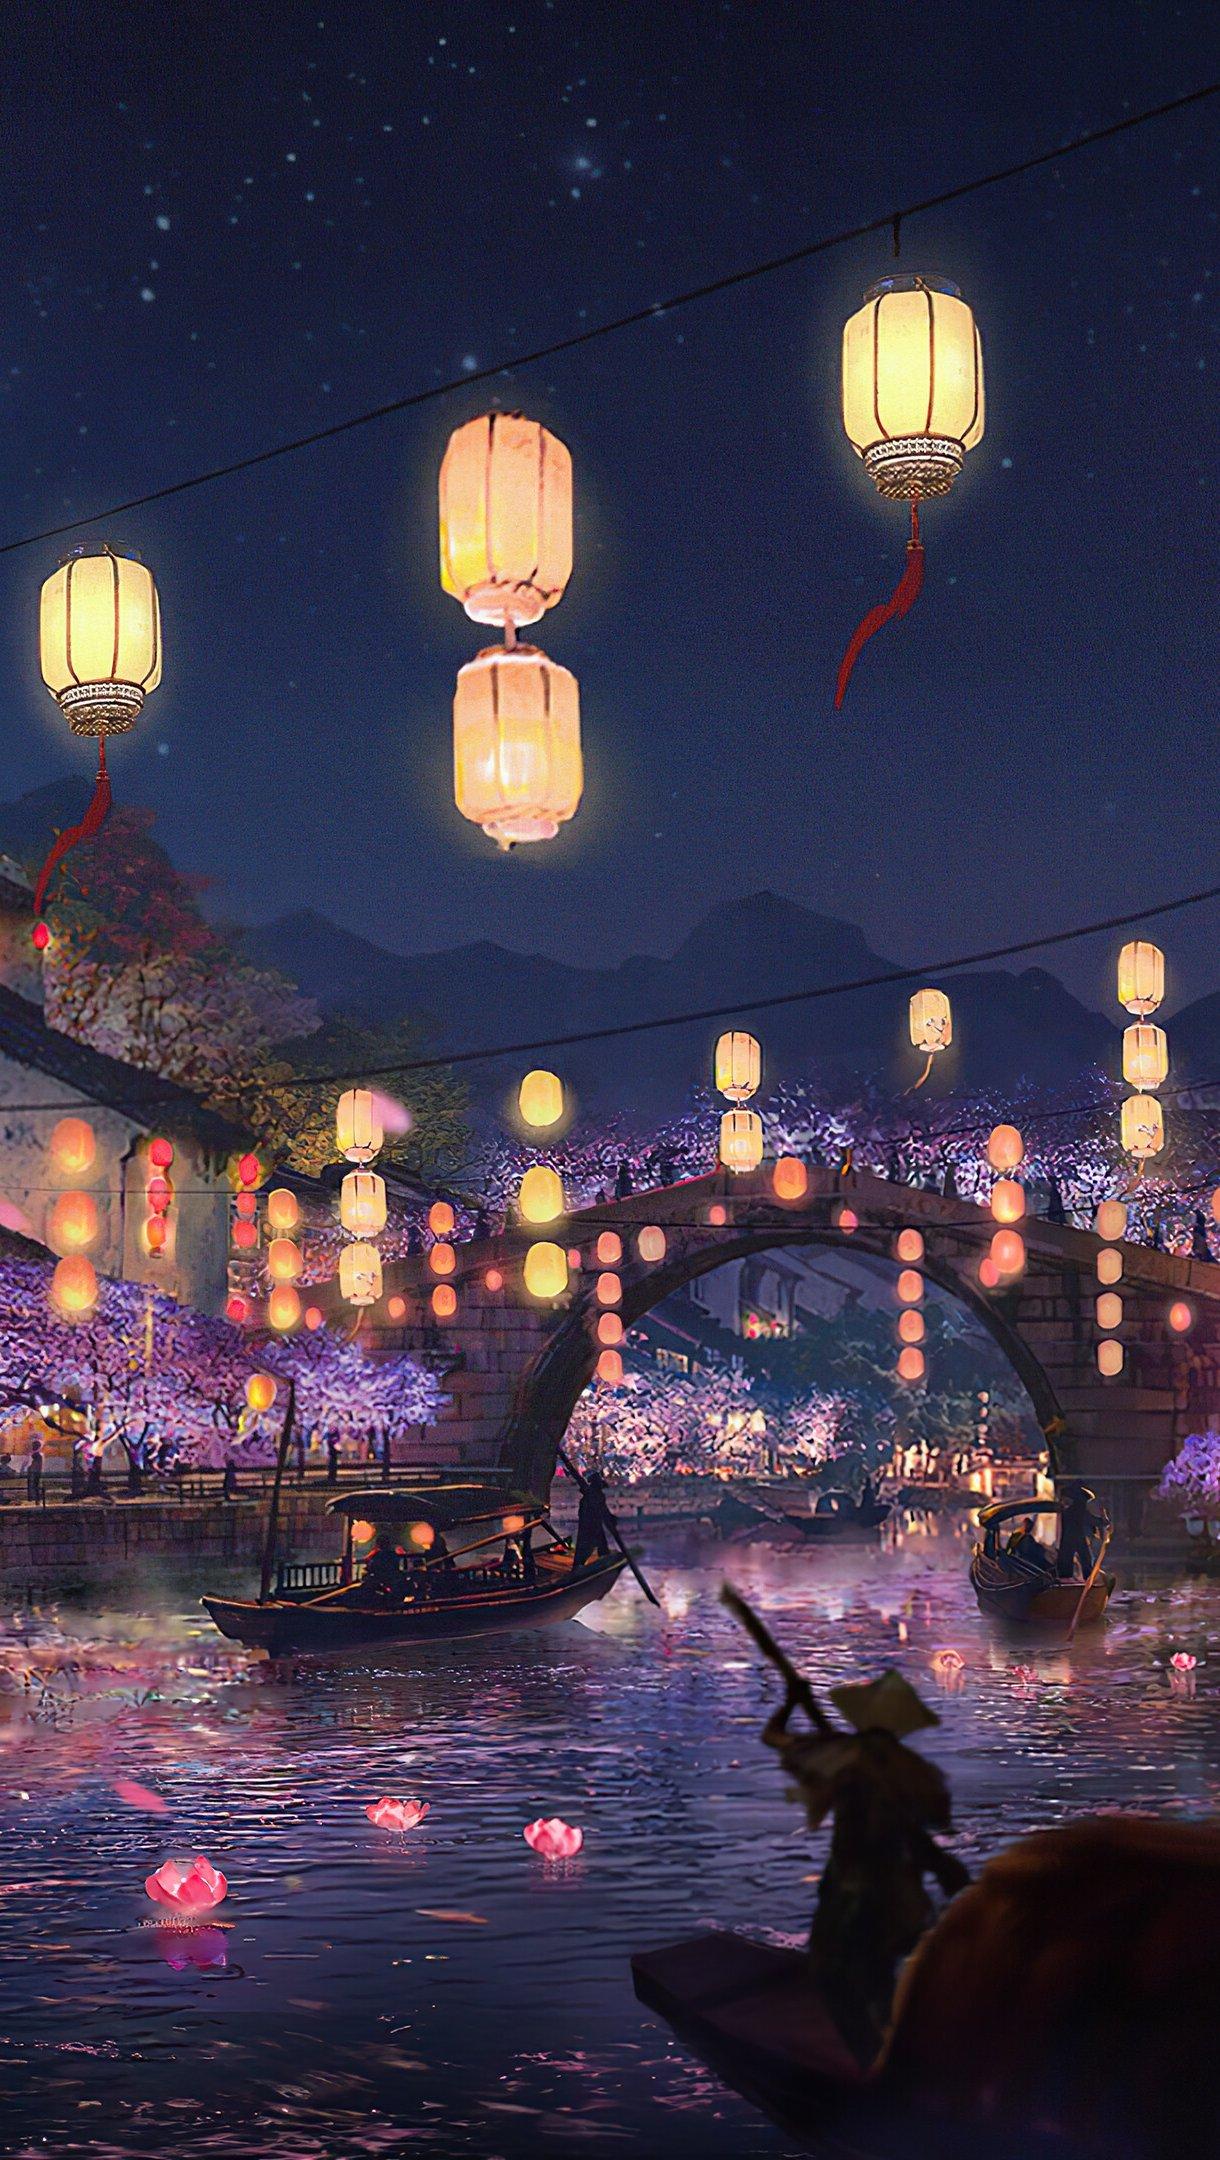 Wallpaper Light Festival at river Digital Art Vertical